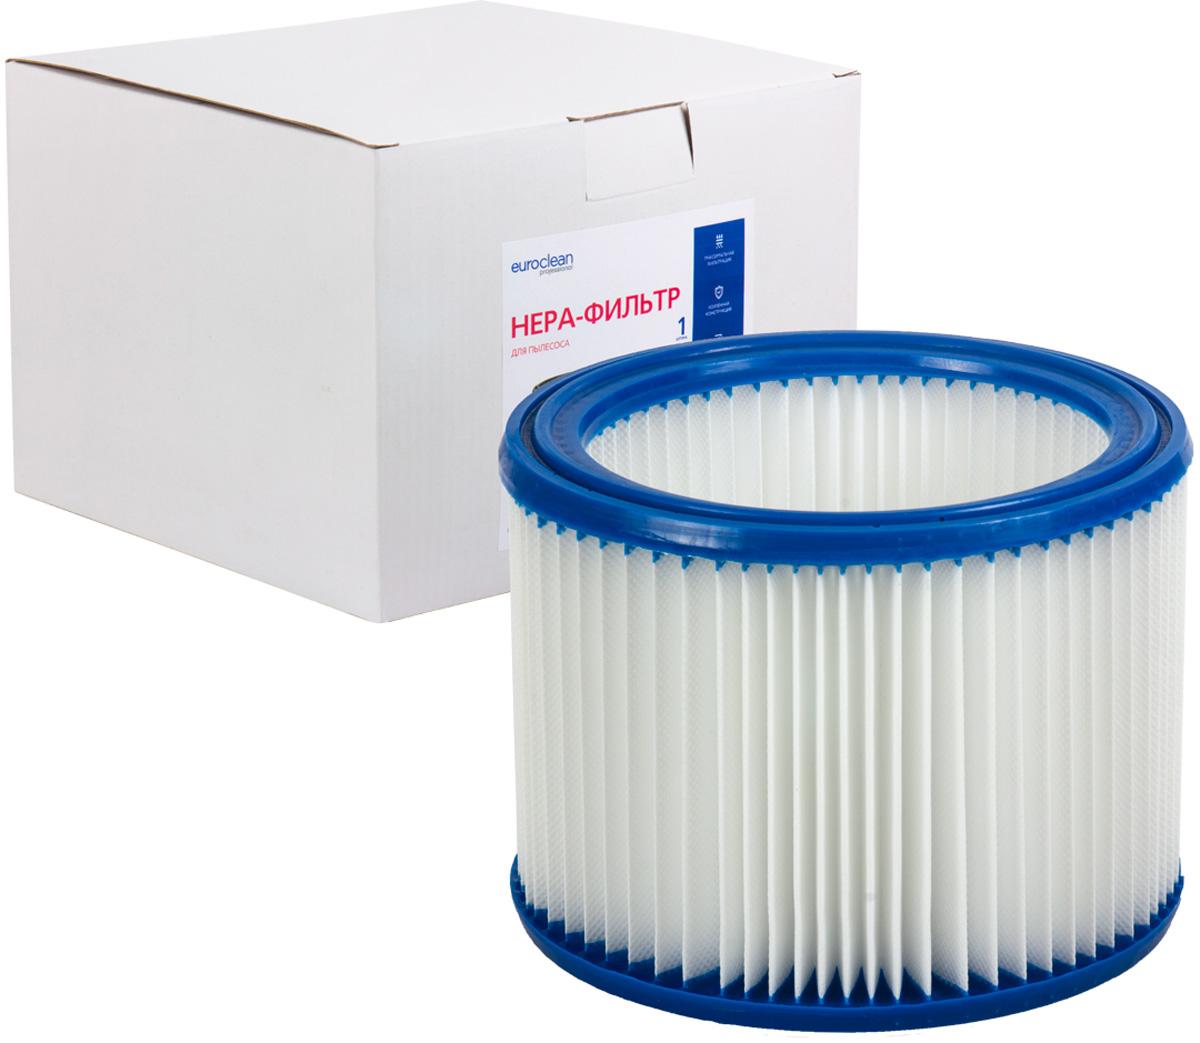 Euroclean BGSM-15 фильтр складчатый для пылесоса BOSCH (аналог 2 607 432 024) euroclean bgpm 35 55 фильтр складчатый для пылесоса bosch аналог 2 607 432 033